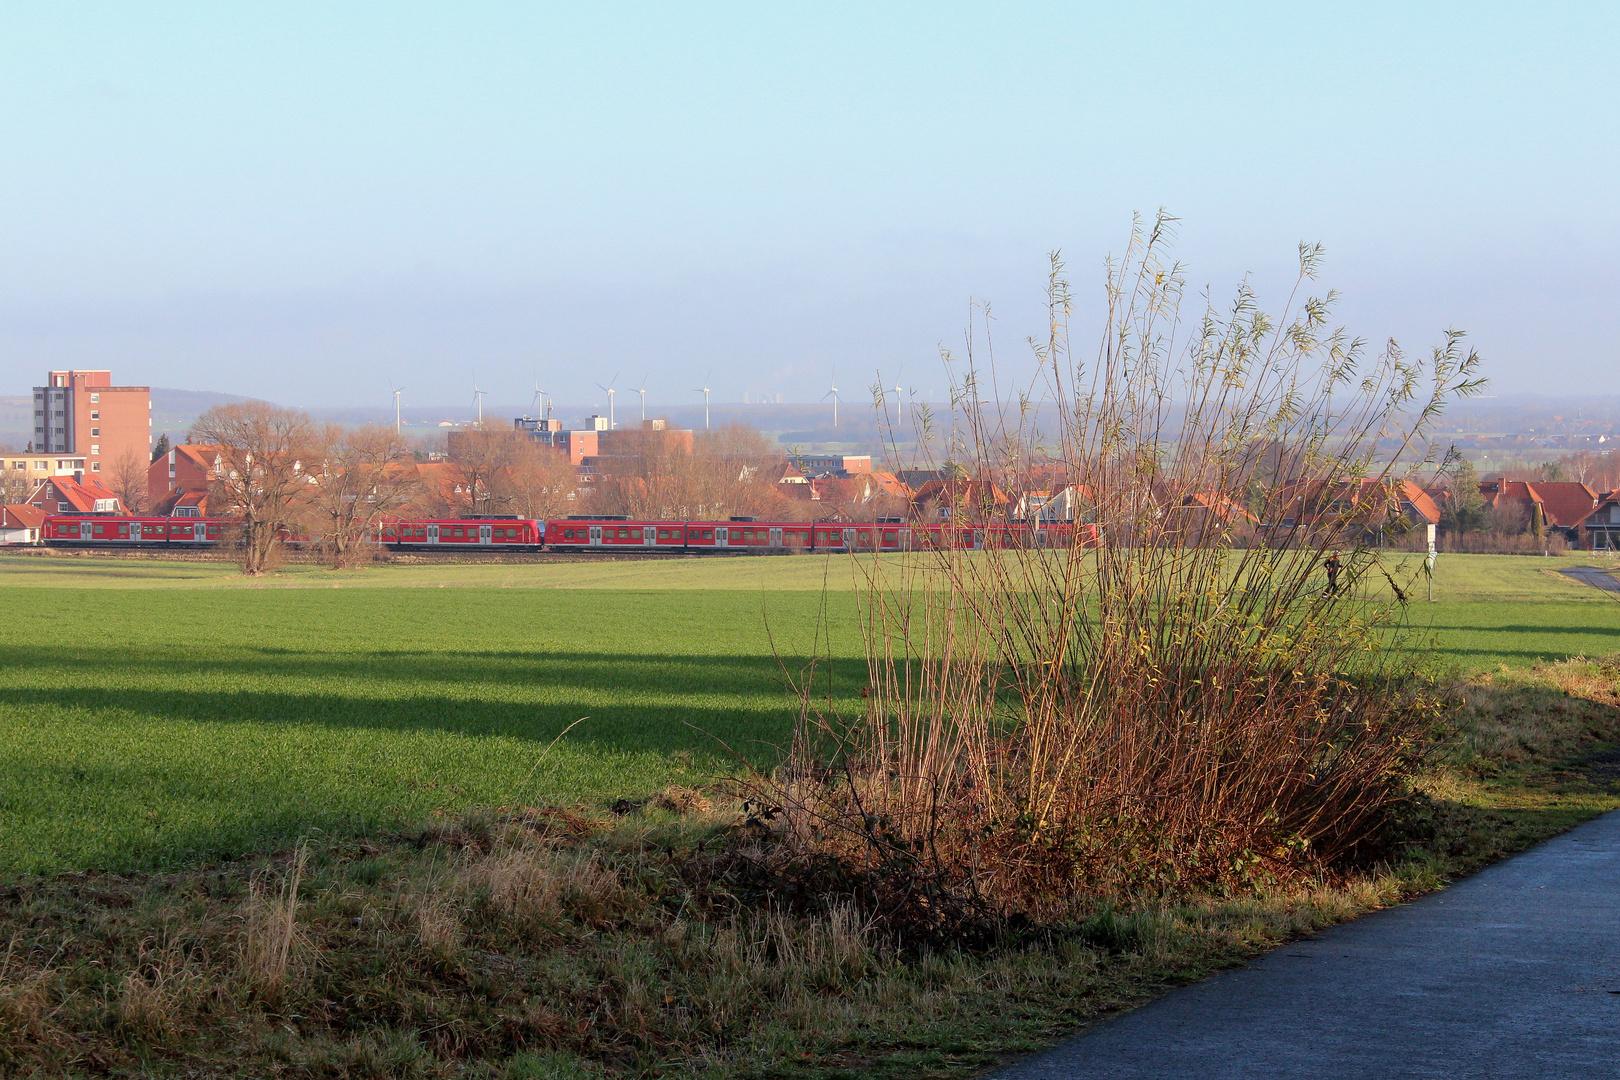 Samstagmorgen in Egestorf